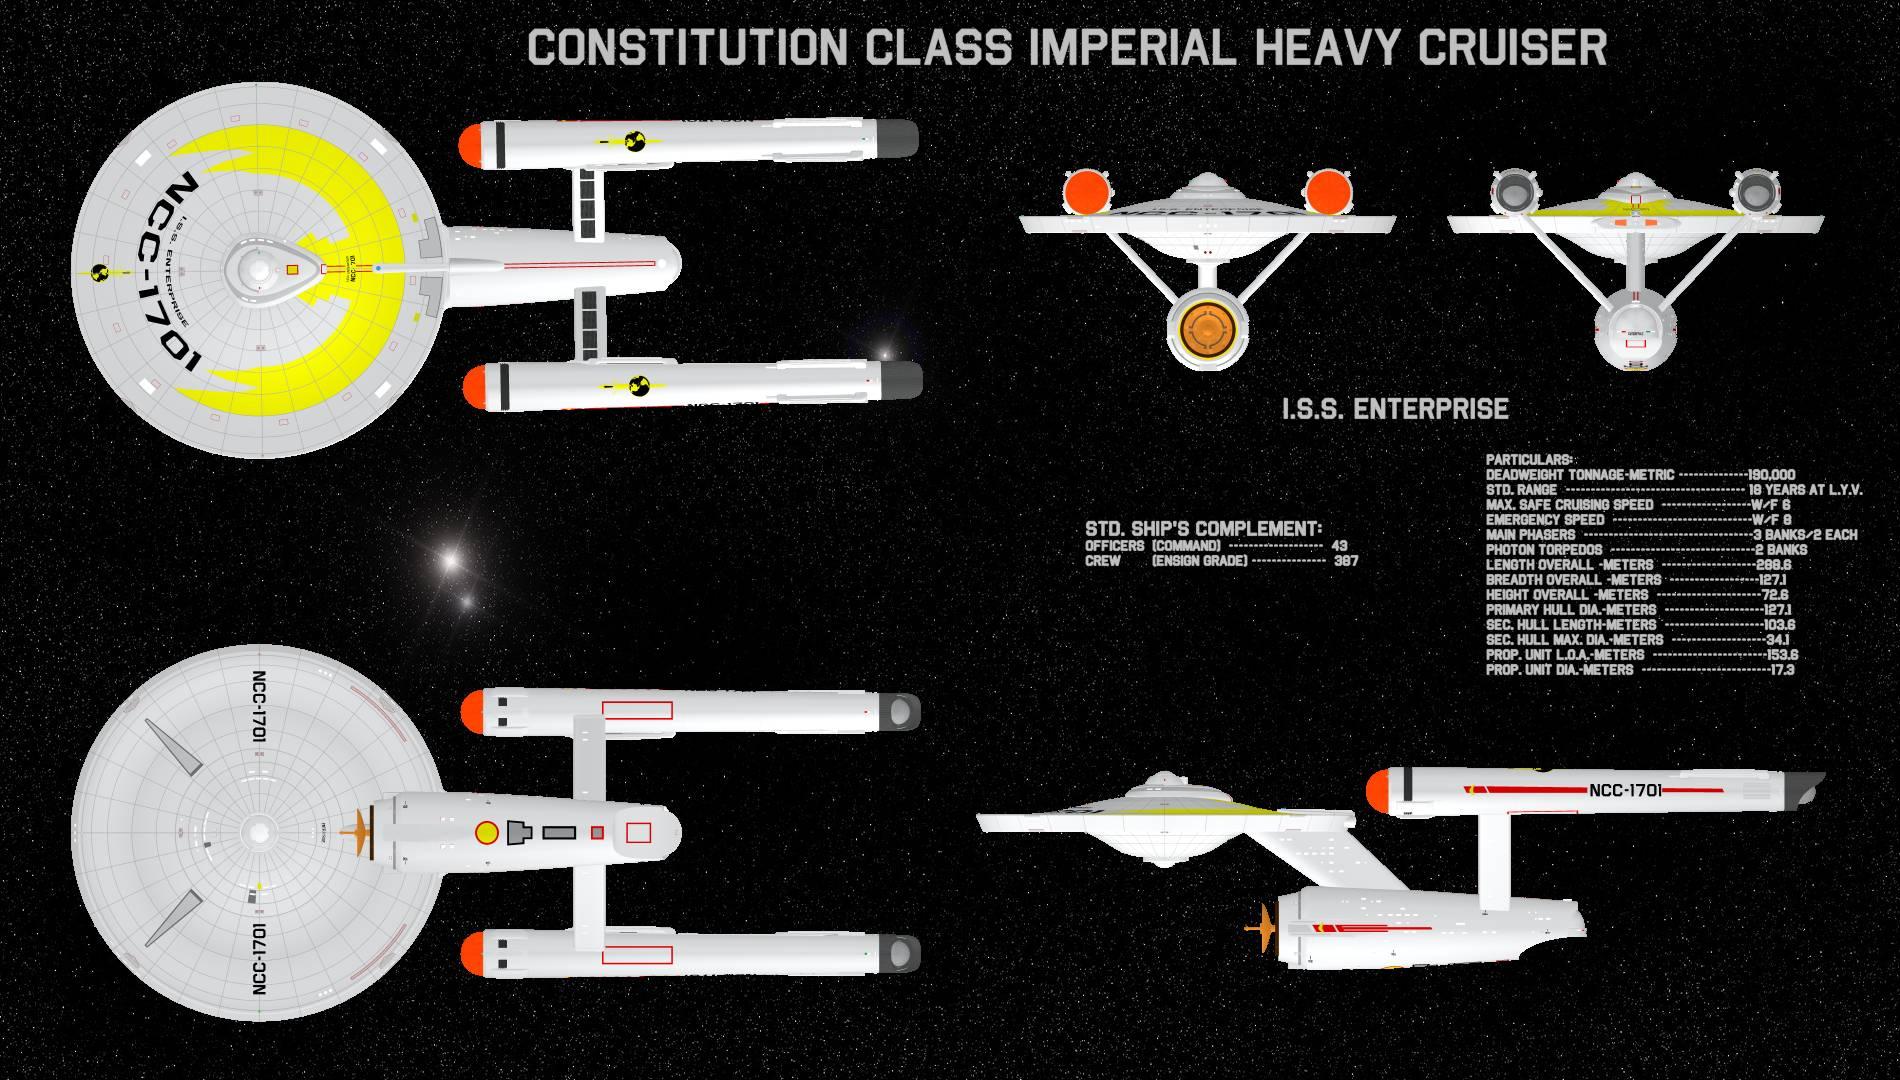 ISS Enterprise - PP2 and OBJ by Greywolf-Starkiller